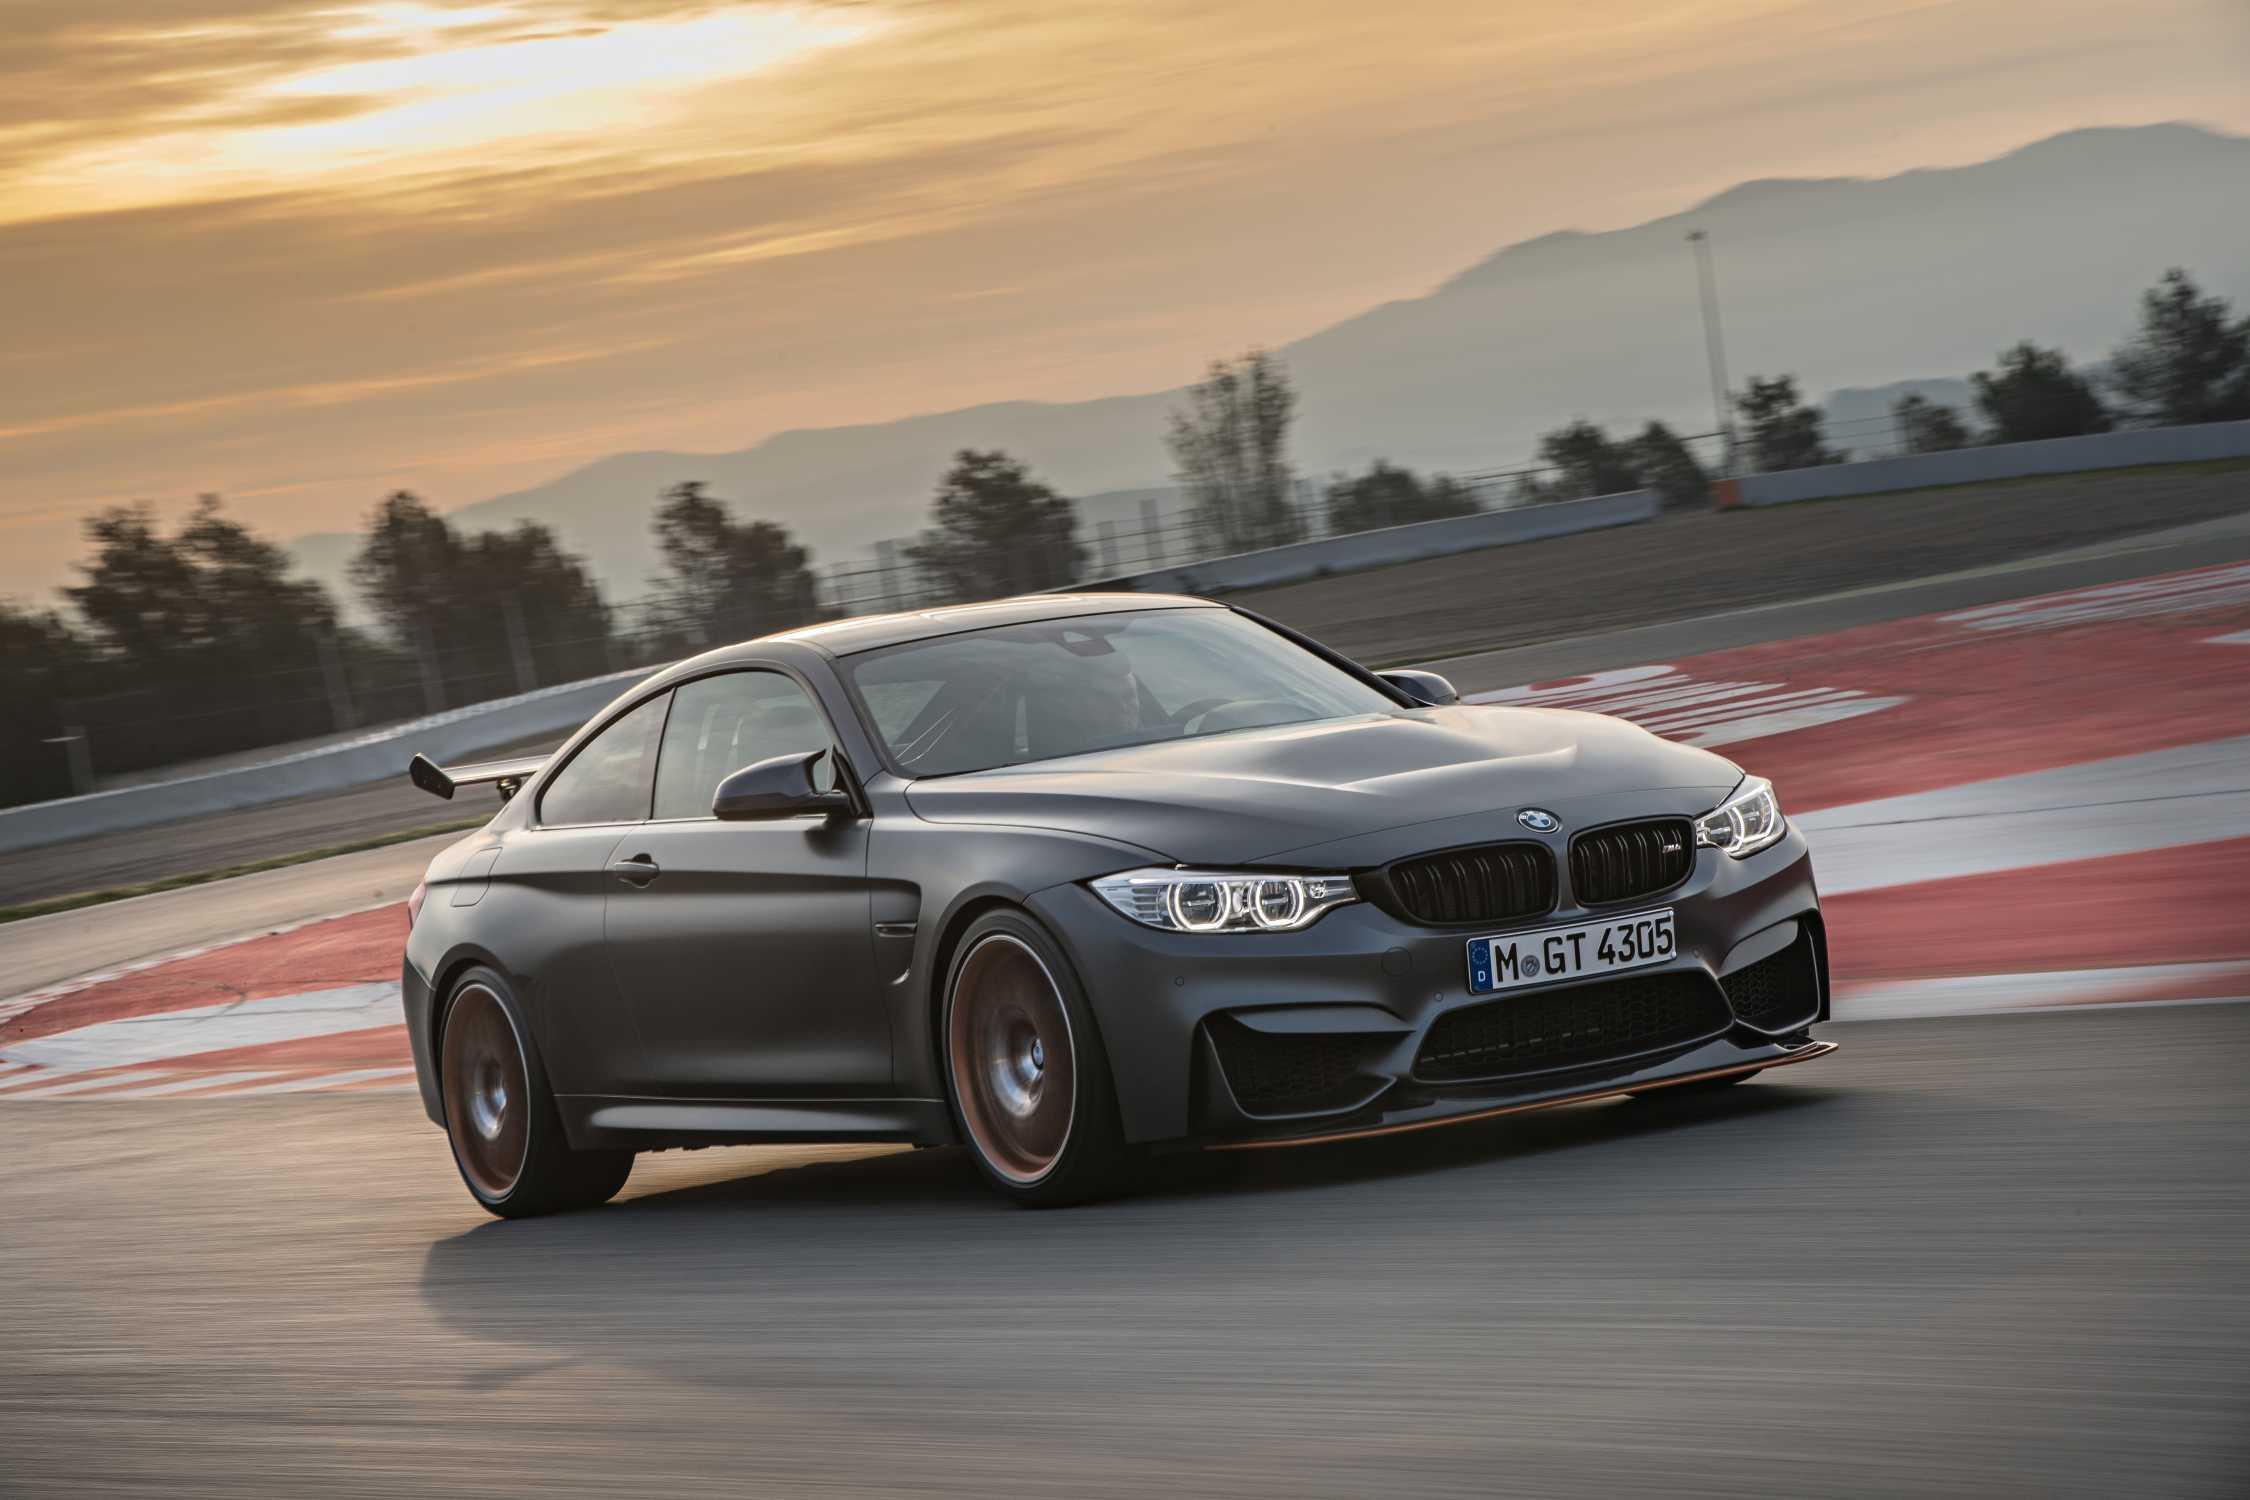 BMW M4 гоночный спорт на треке